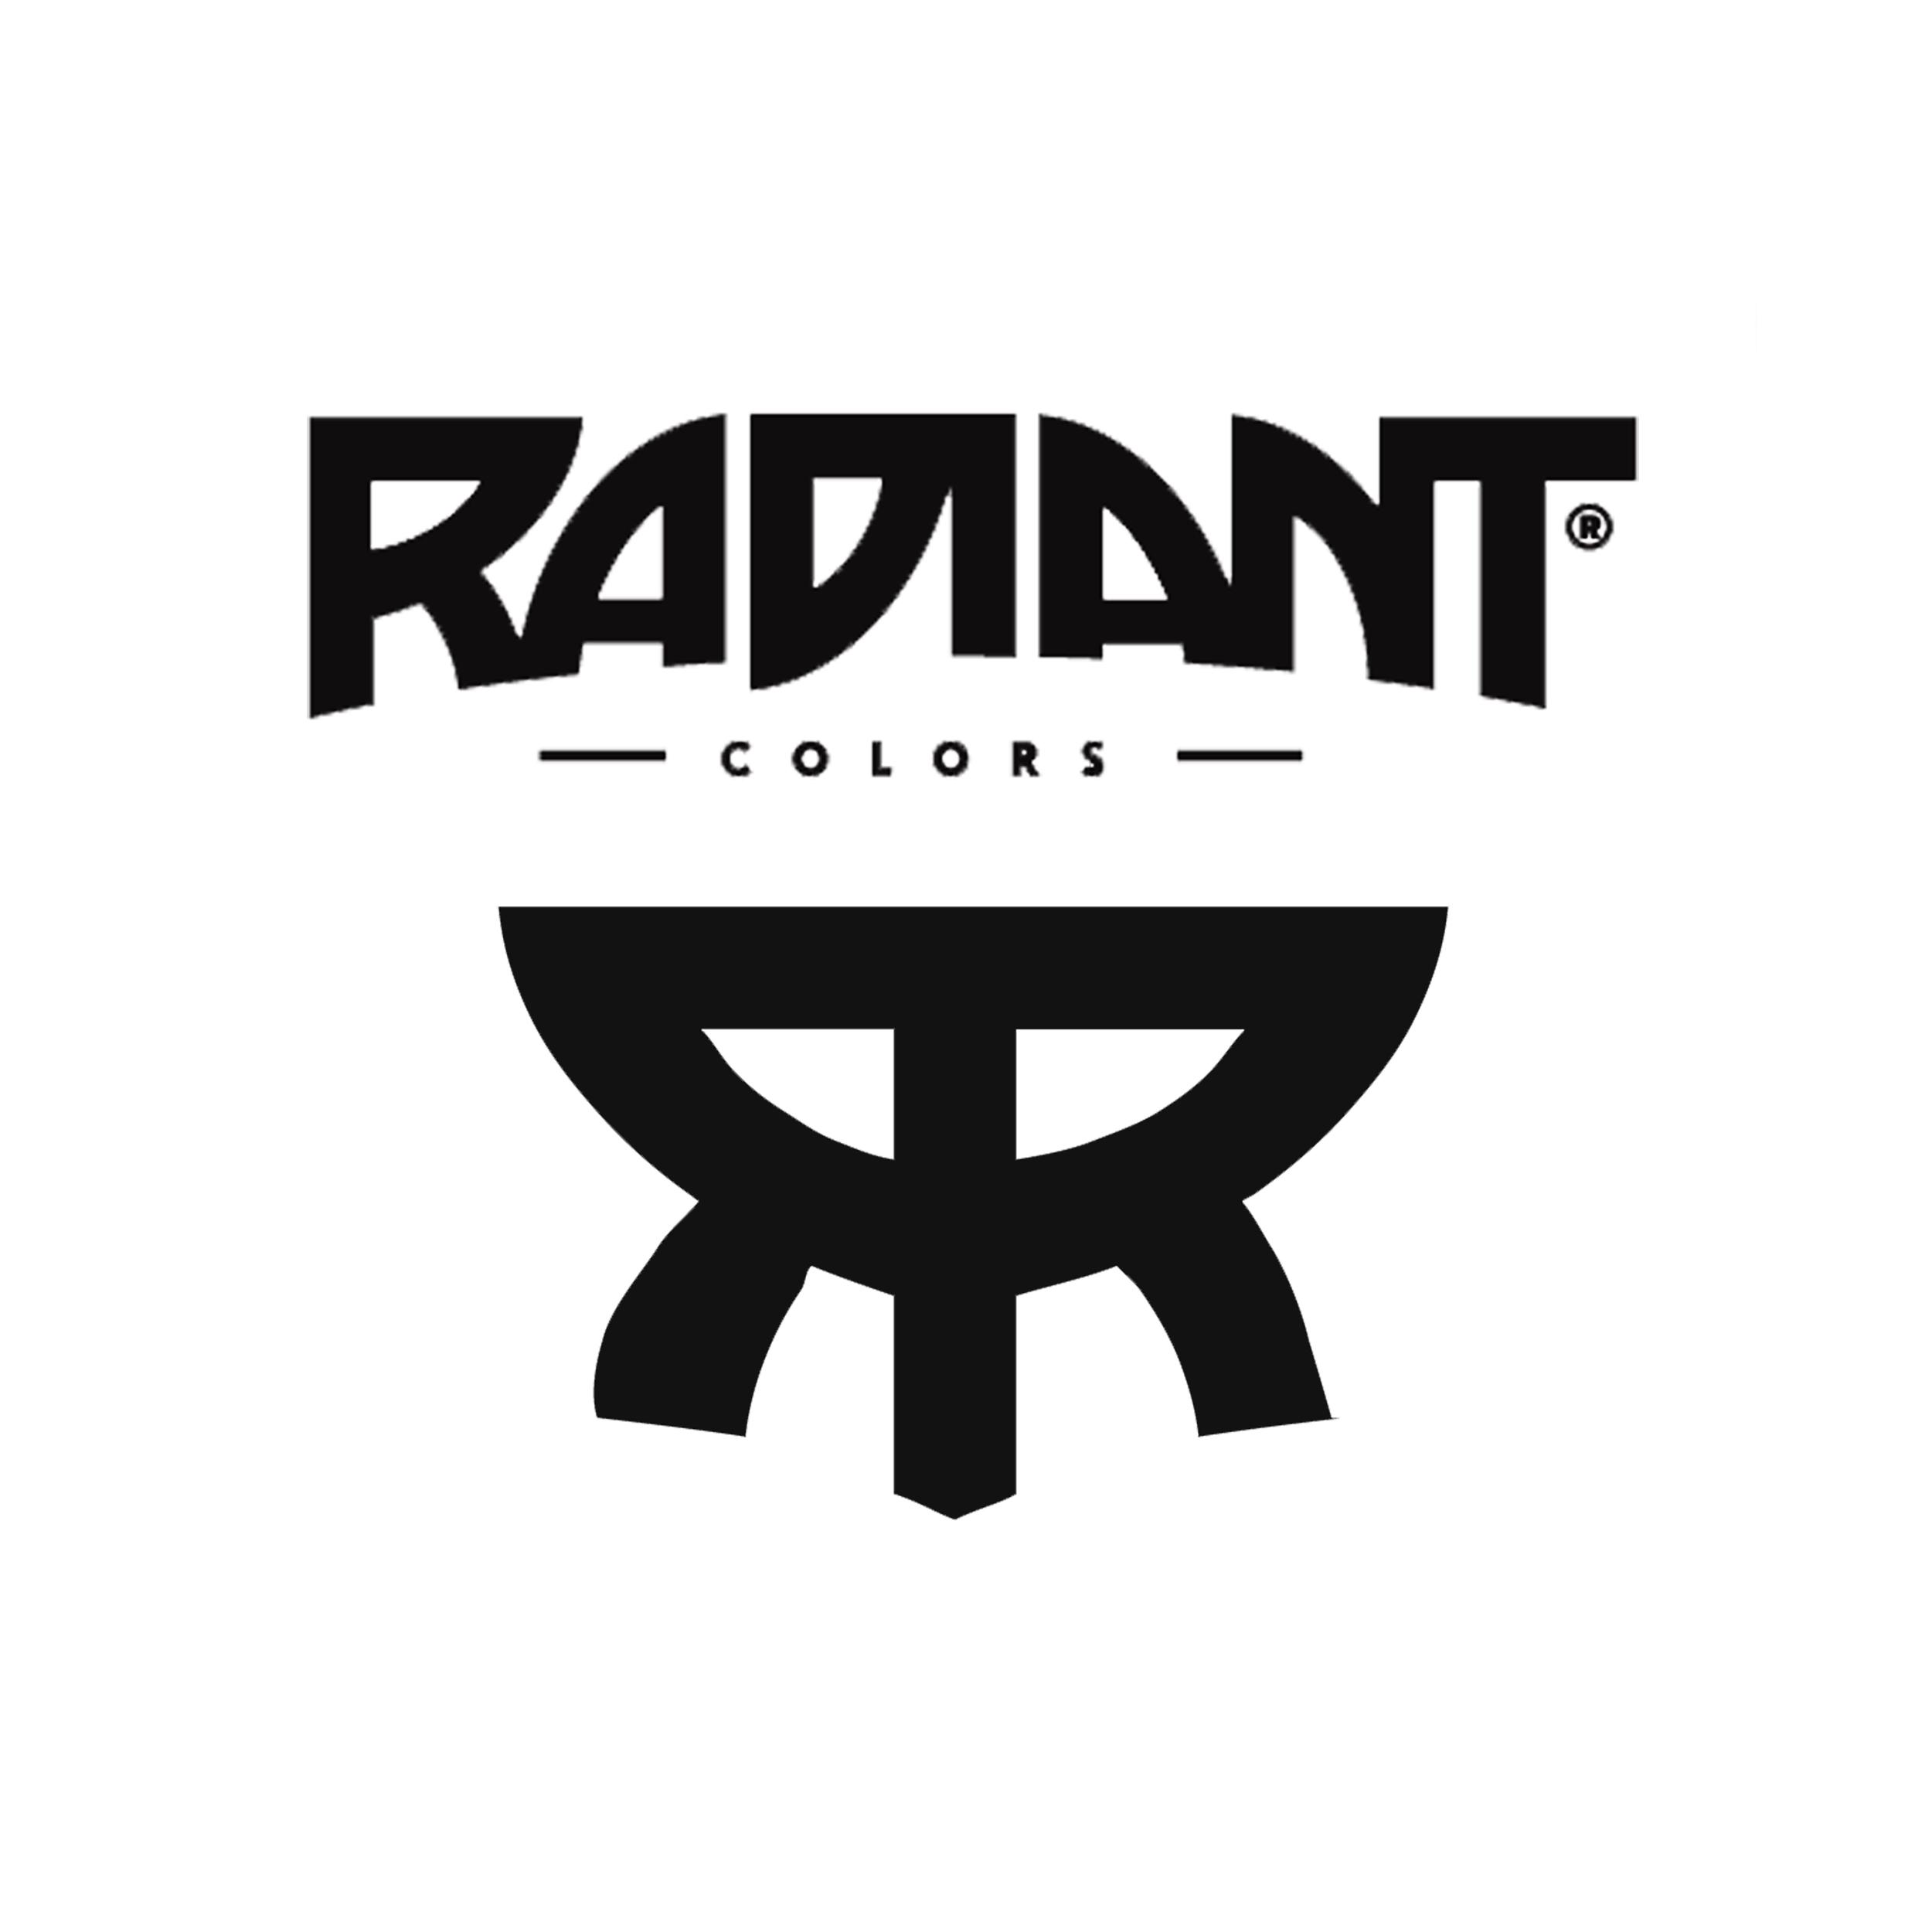 Radiant Colours